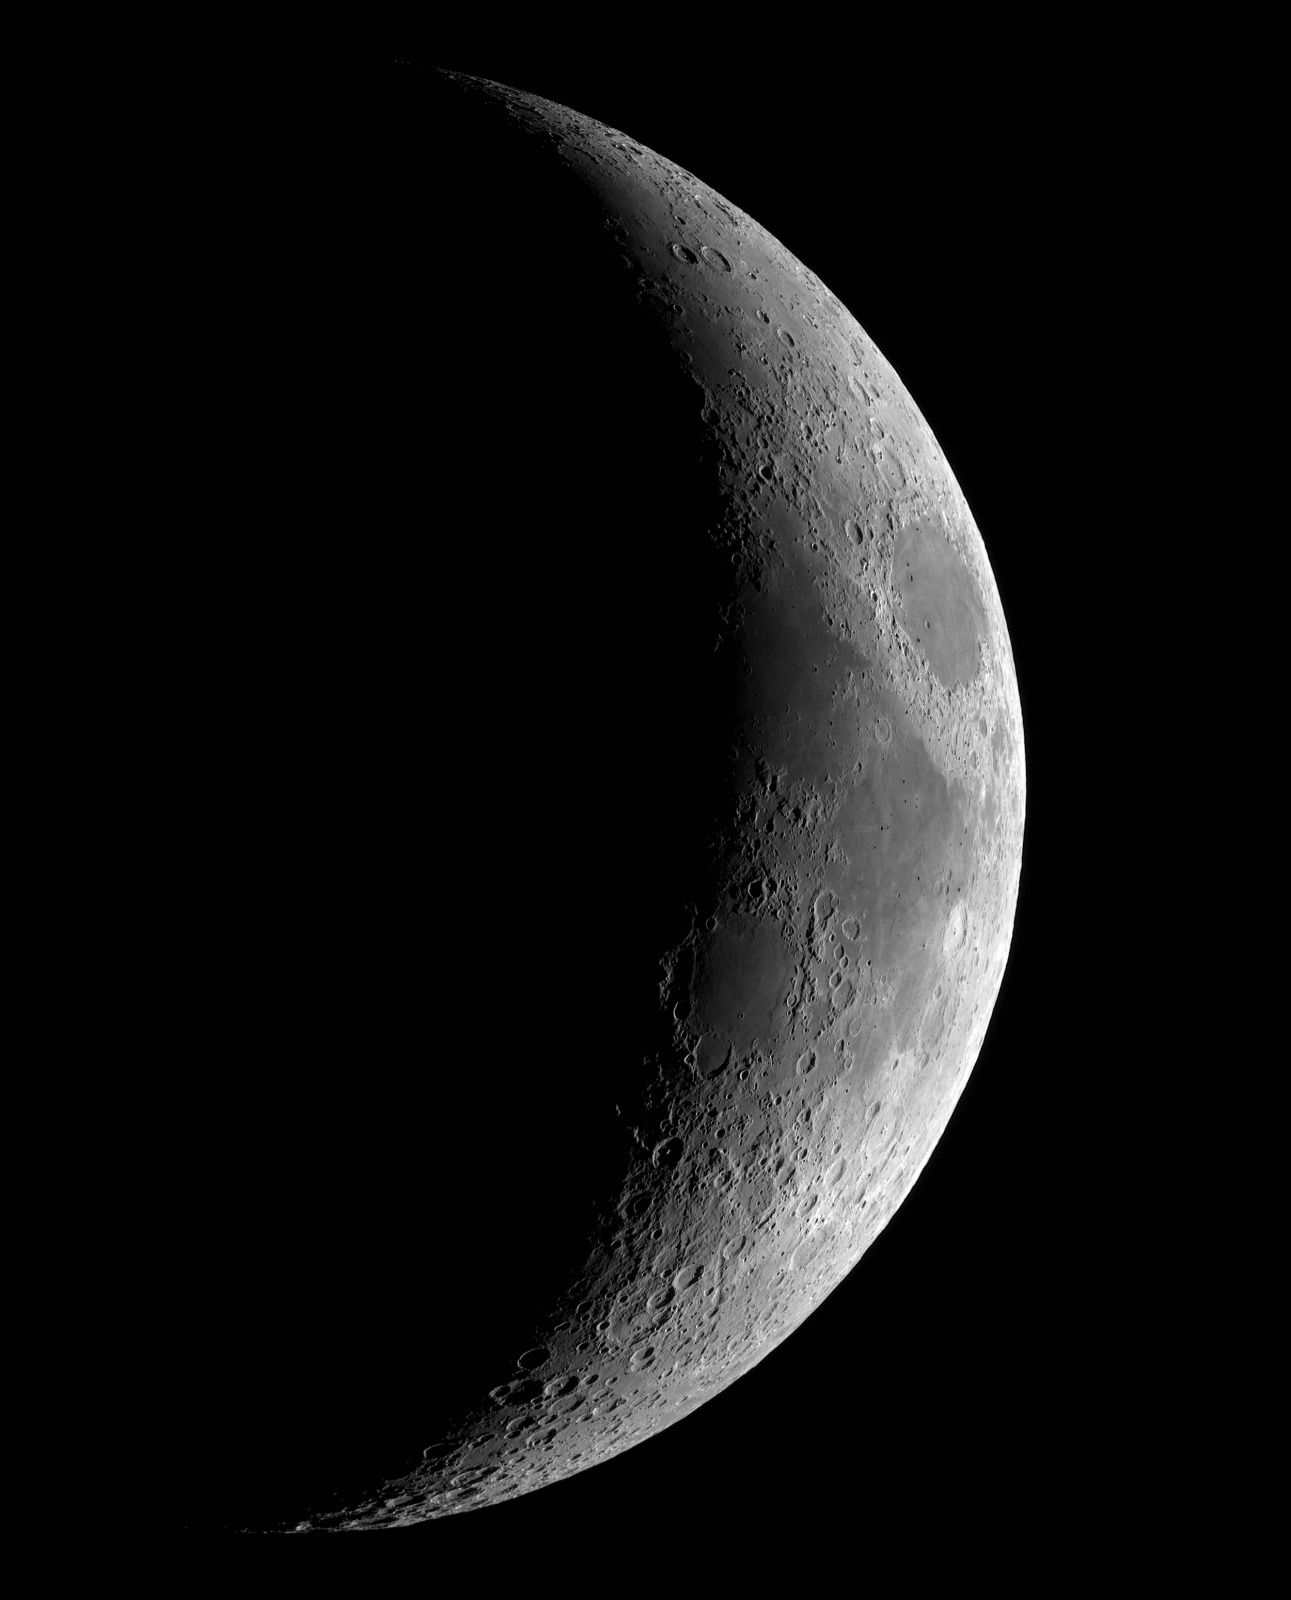 Księżyc 5d  16.05.2021r_21.00_TS152F900_ASI290MM_Omegon Halpha 12nm_Mozaika105%....jpg